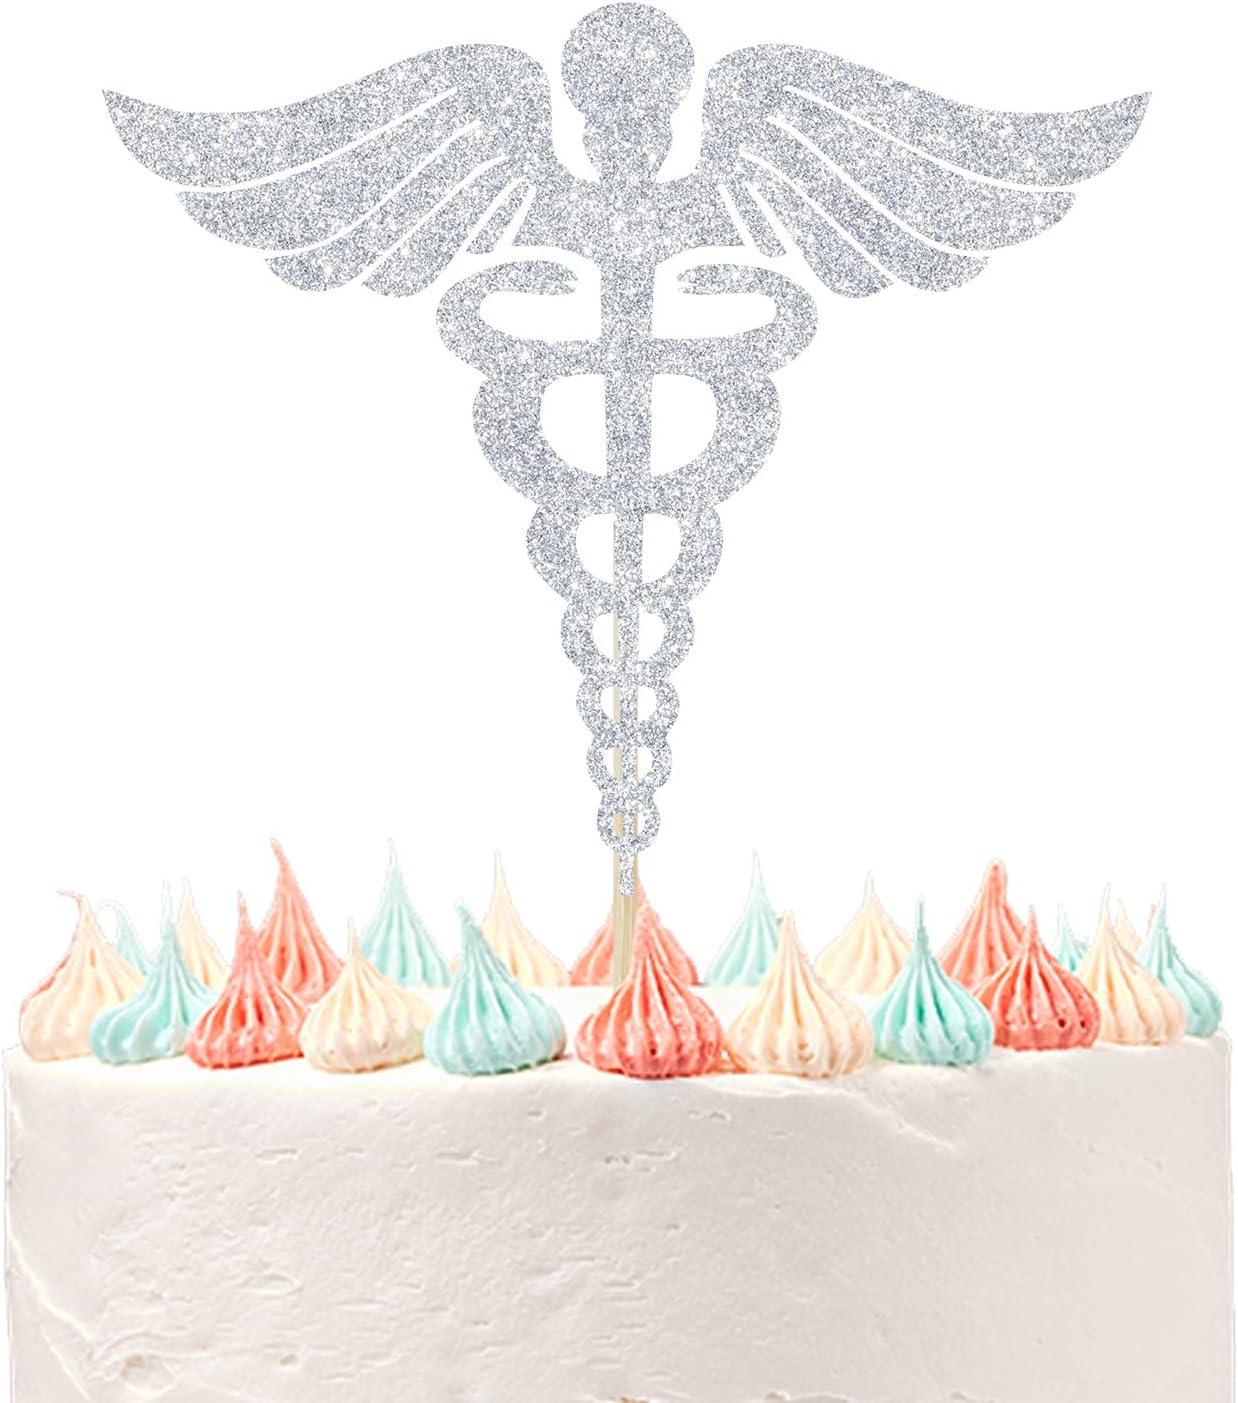 Nursing Cake Toppers for Nurse Graduation Birthday Party Decor, Medical RN Nurse Graduation Party Supplies Silver Glitter.